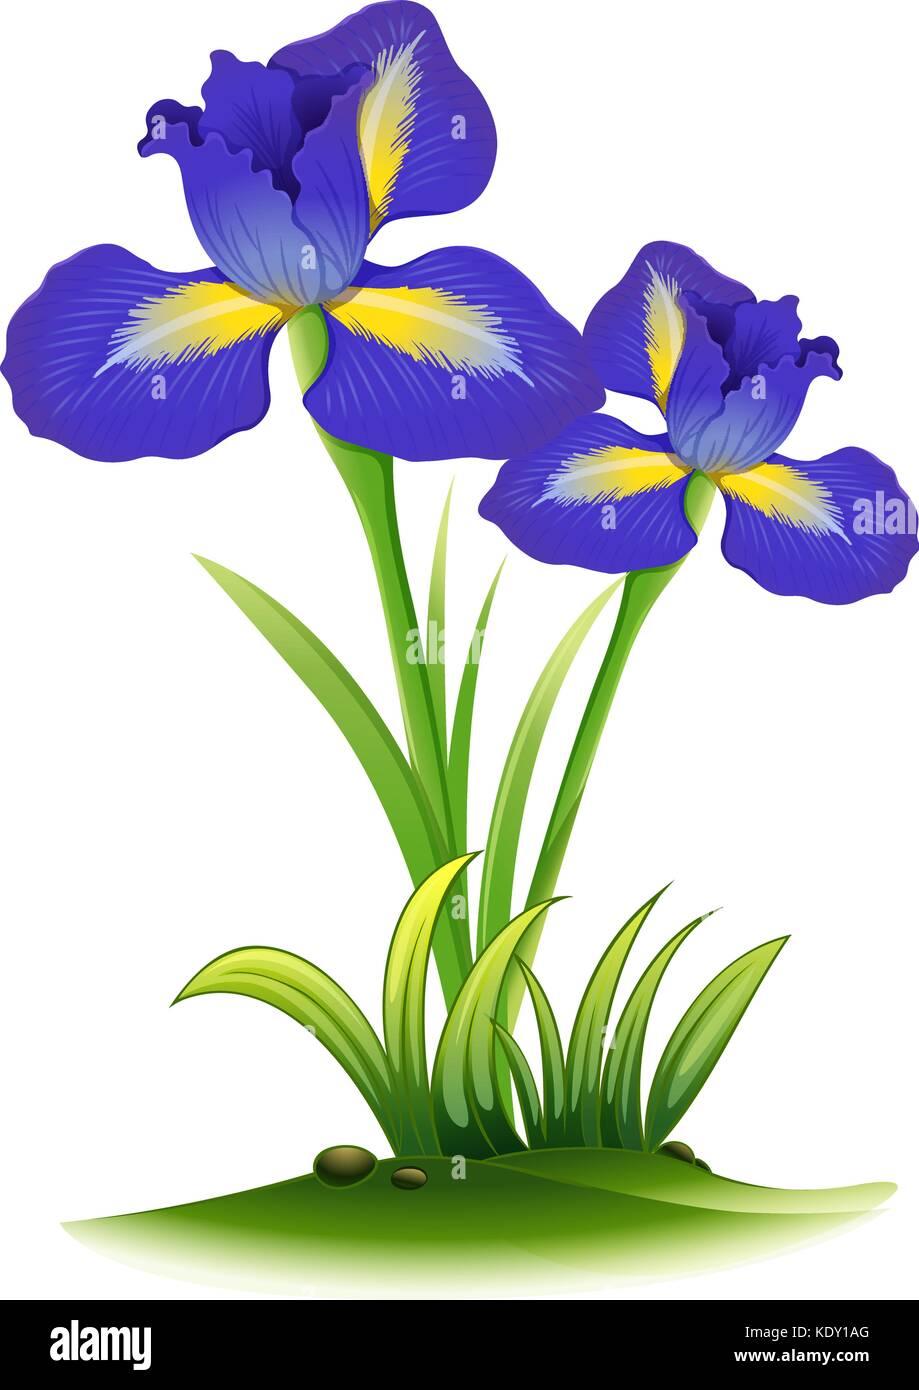 blue iris flowers in bush illustration stock vector art rh alamy com